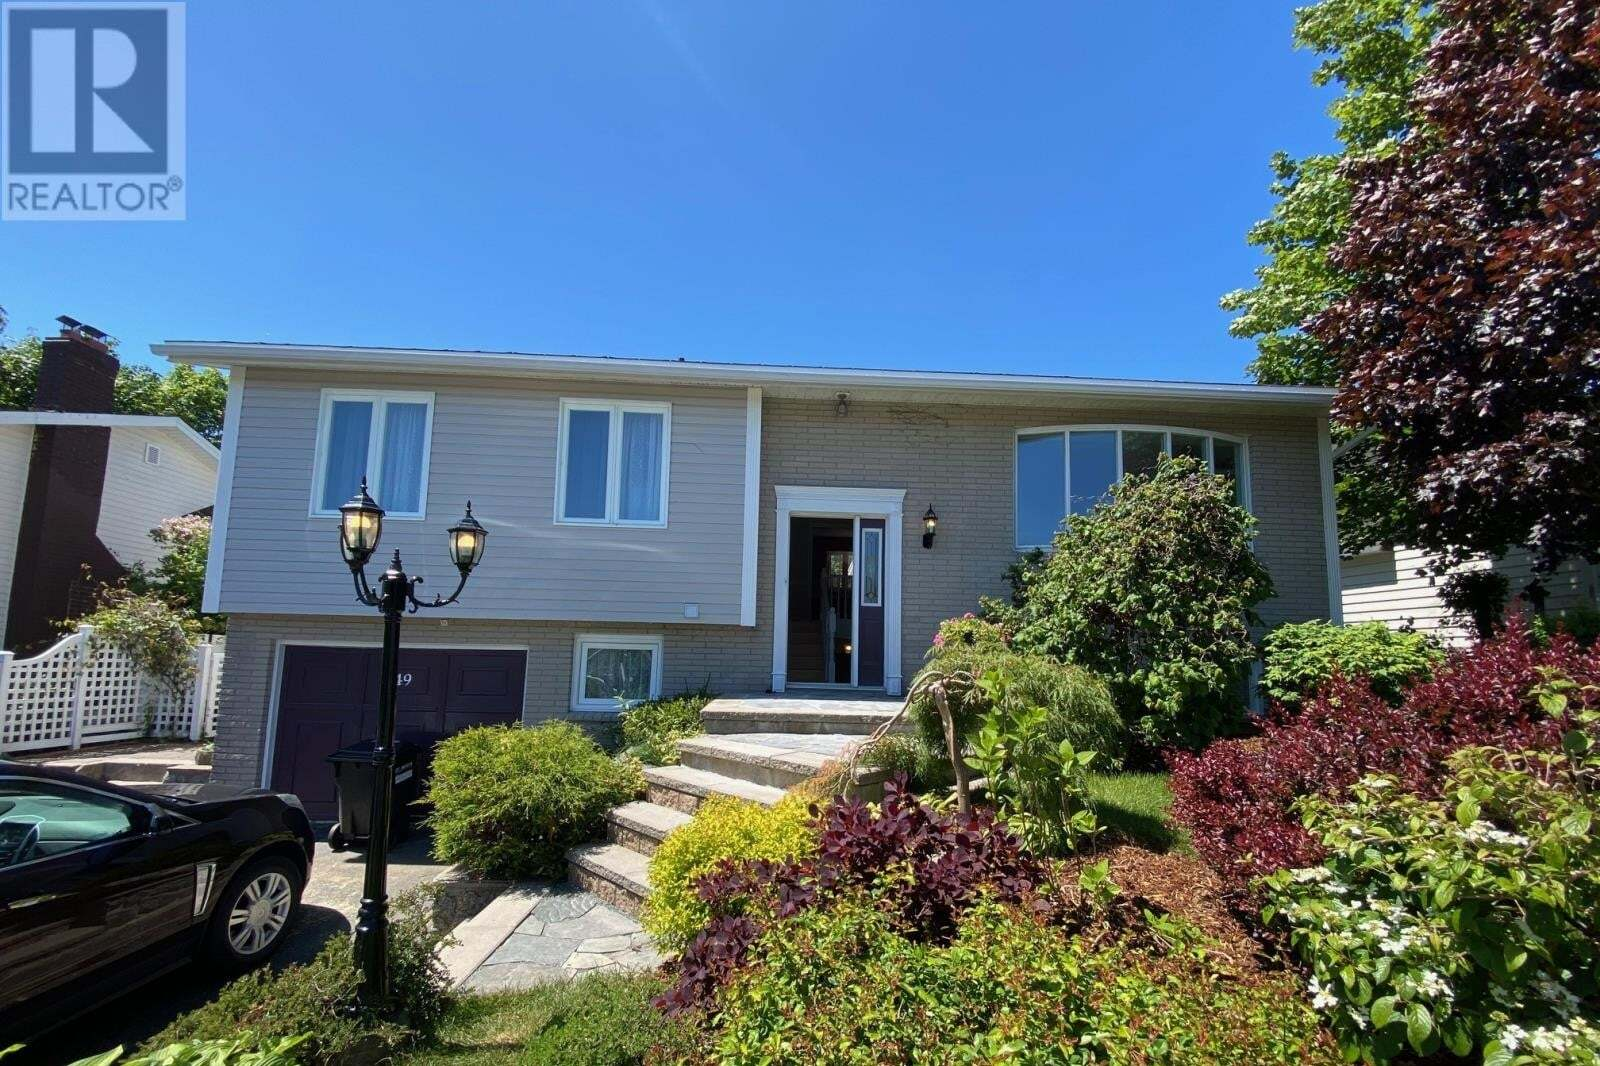 House for sale at 49 Toronto St St. John's Newfoundland - MLS: 1217357